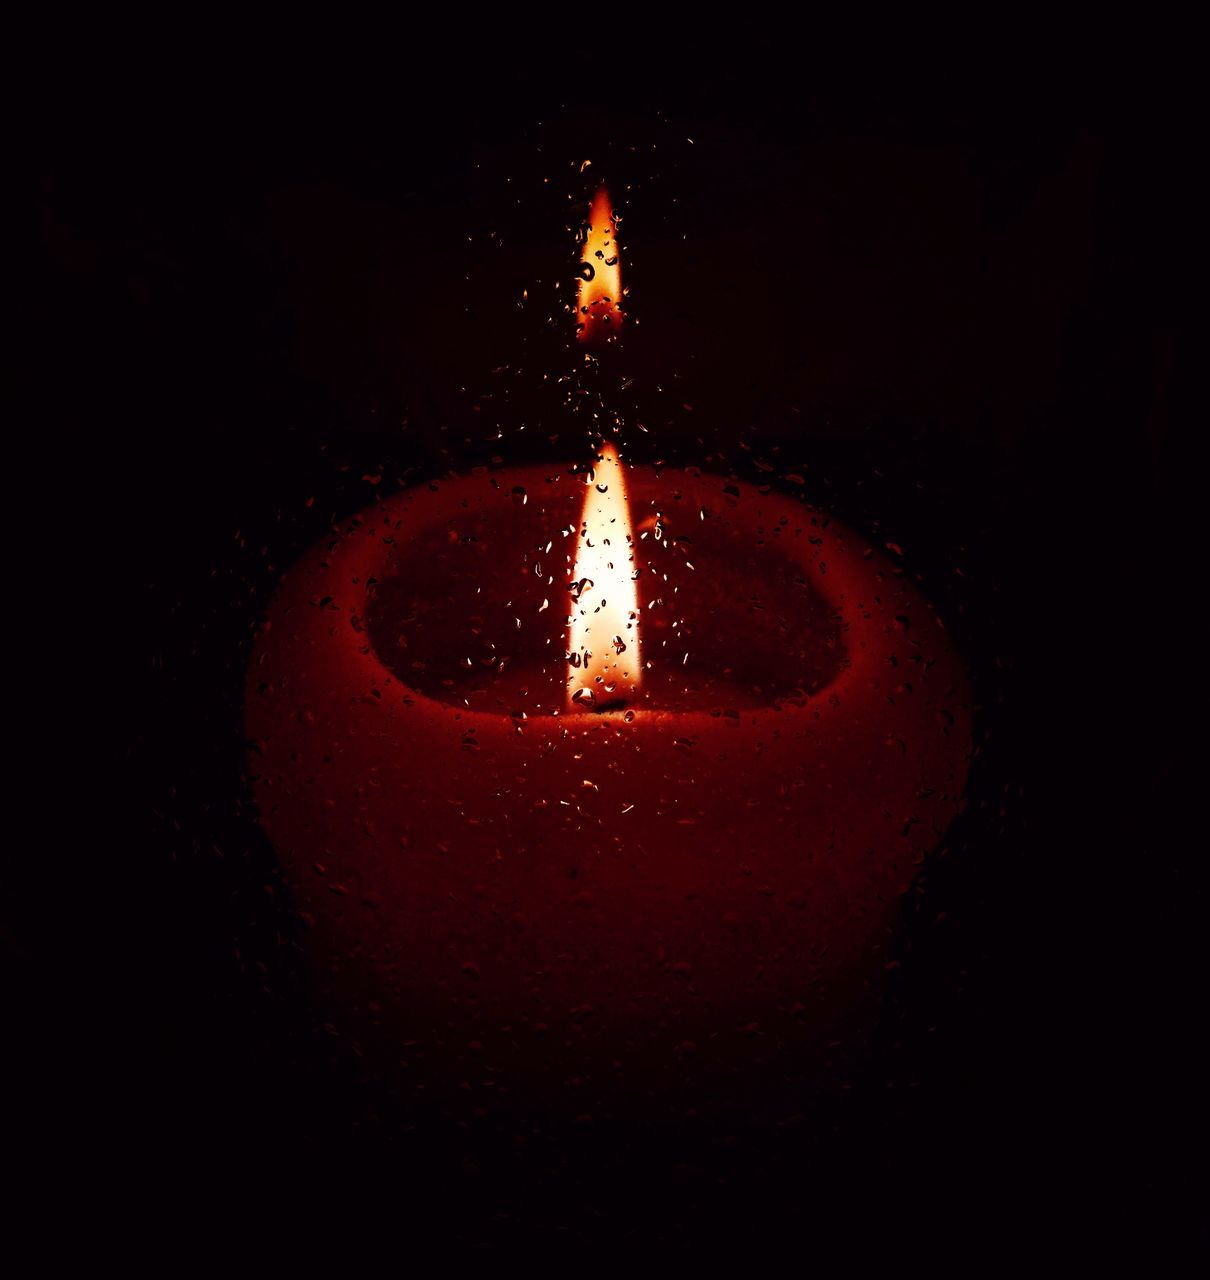 flame, burning, candle, heat - temperature, glowing, celebration, illuminated, no people, diya - oil lamp, close-up, night, darkroom, red, oil lamp, indoors, melting, diwali, black background